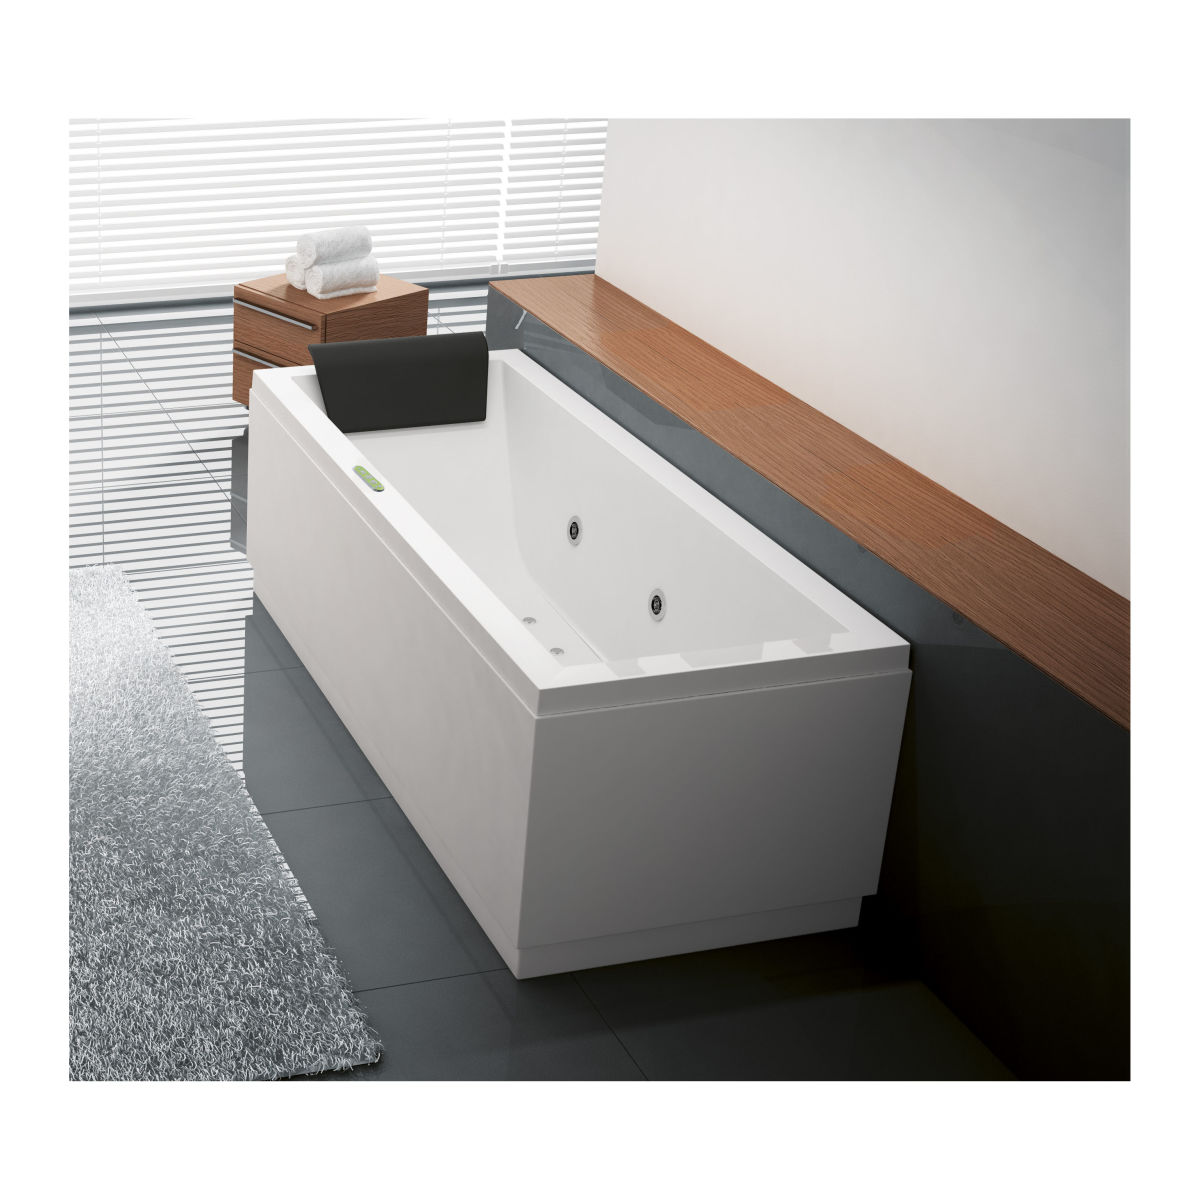 Favorito Vasca idromassaggio Amea 170 x 70 cm: prezzi e offerte online YV75